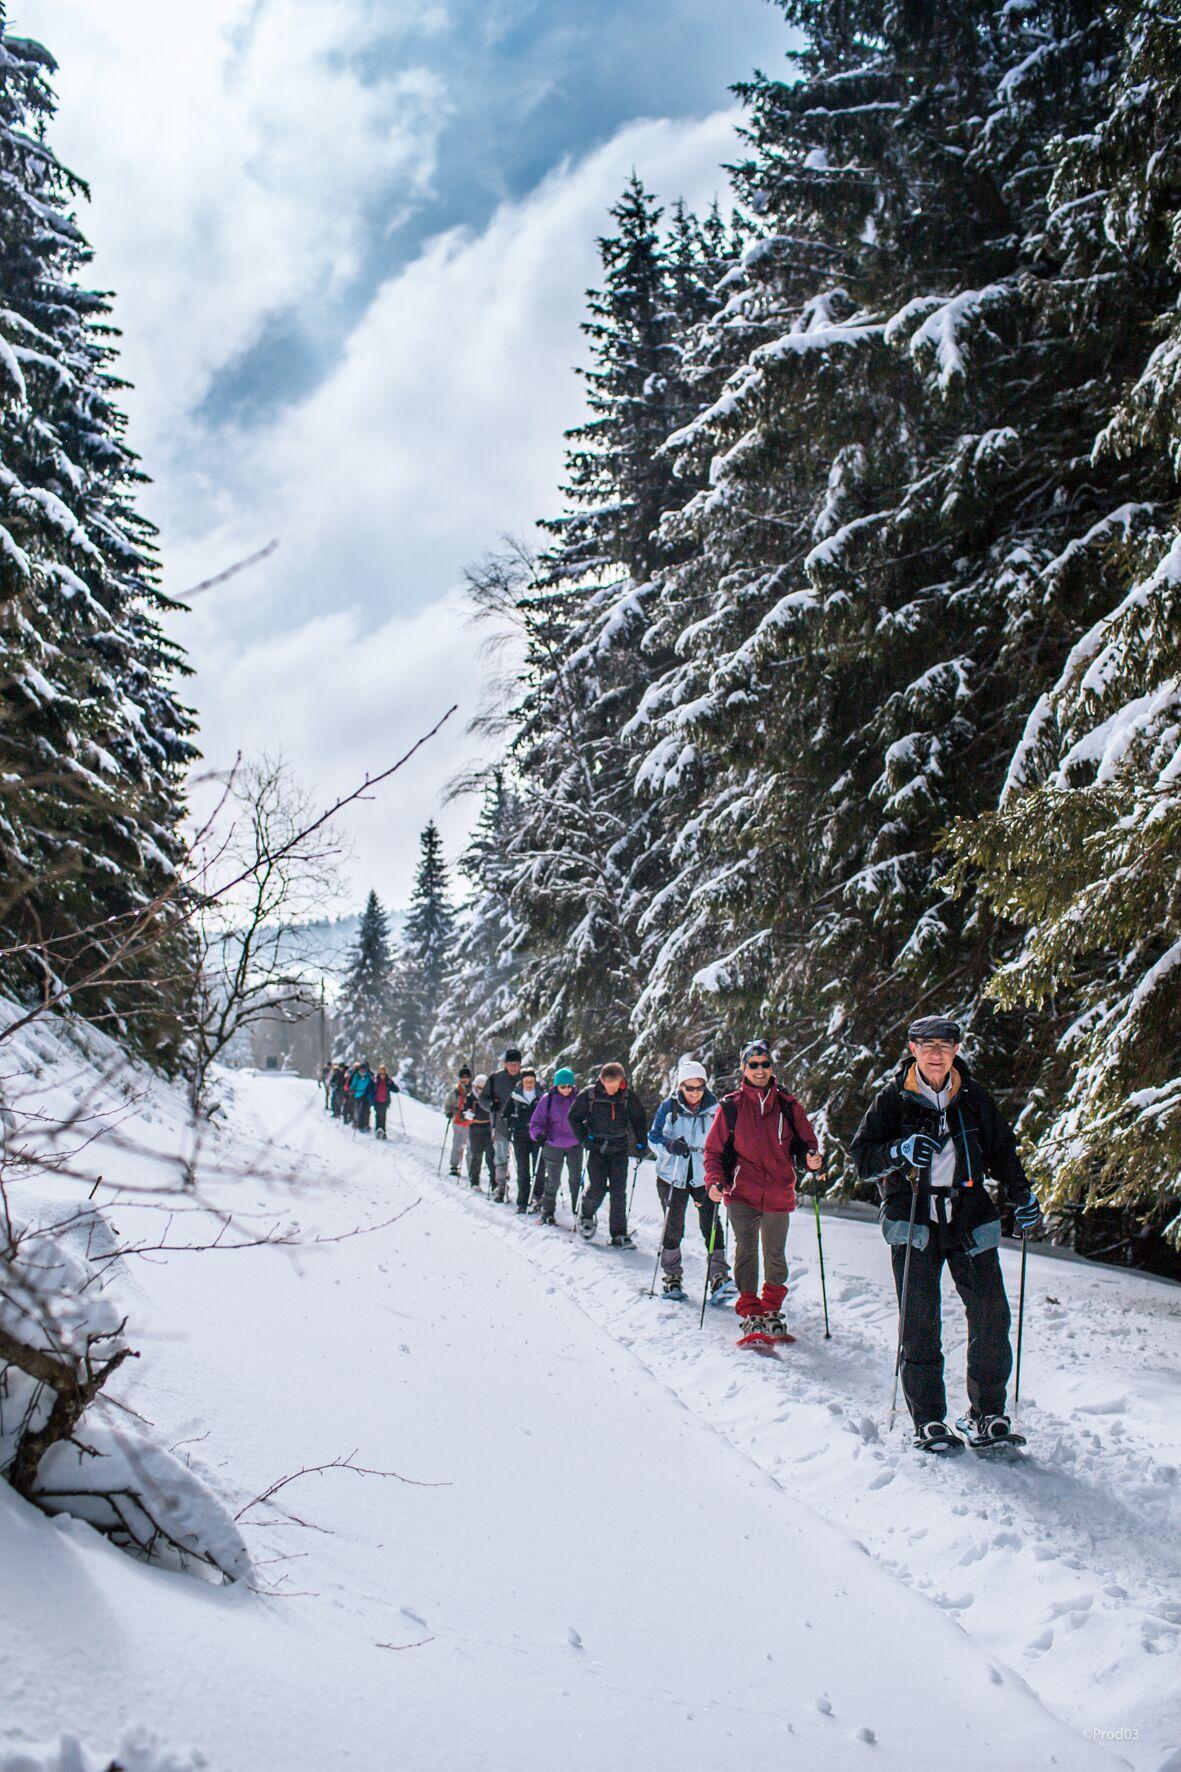 praboure-station-de-ski-hiver-randonnee-ski-de-fond-3